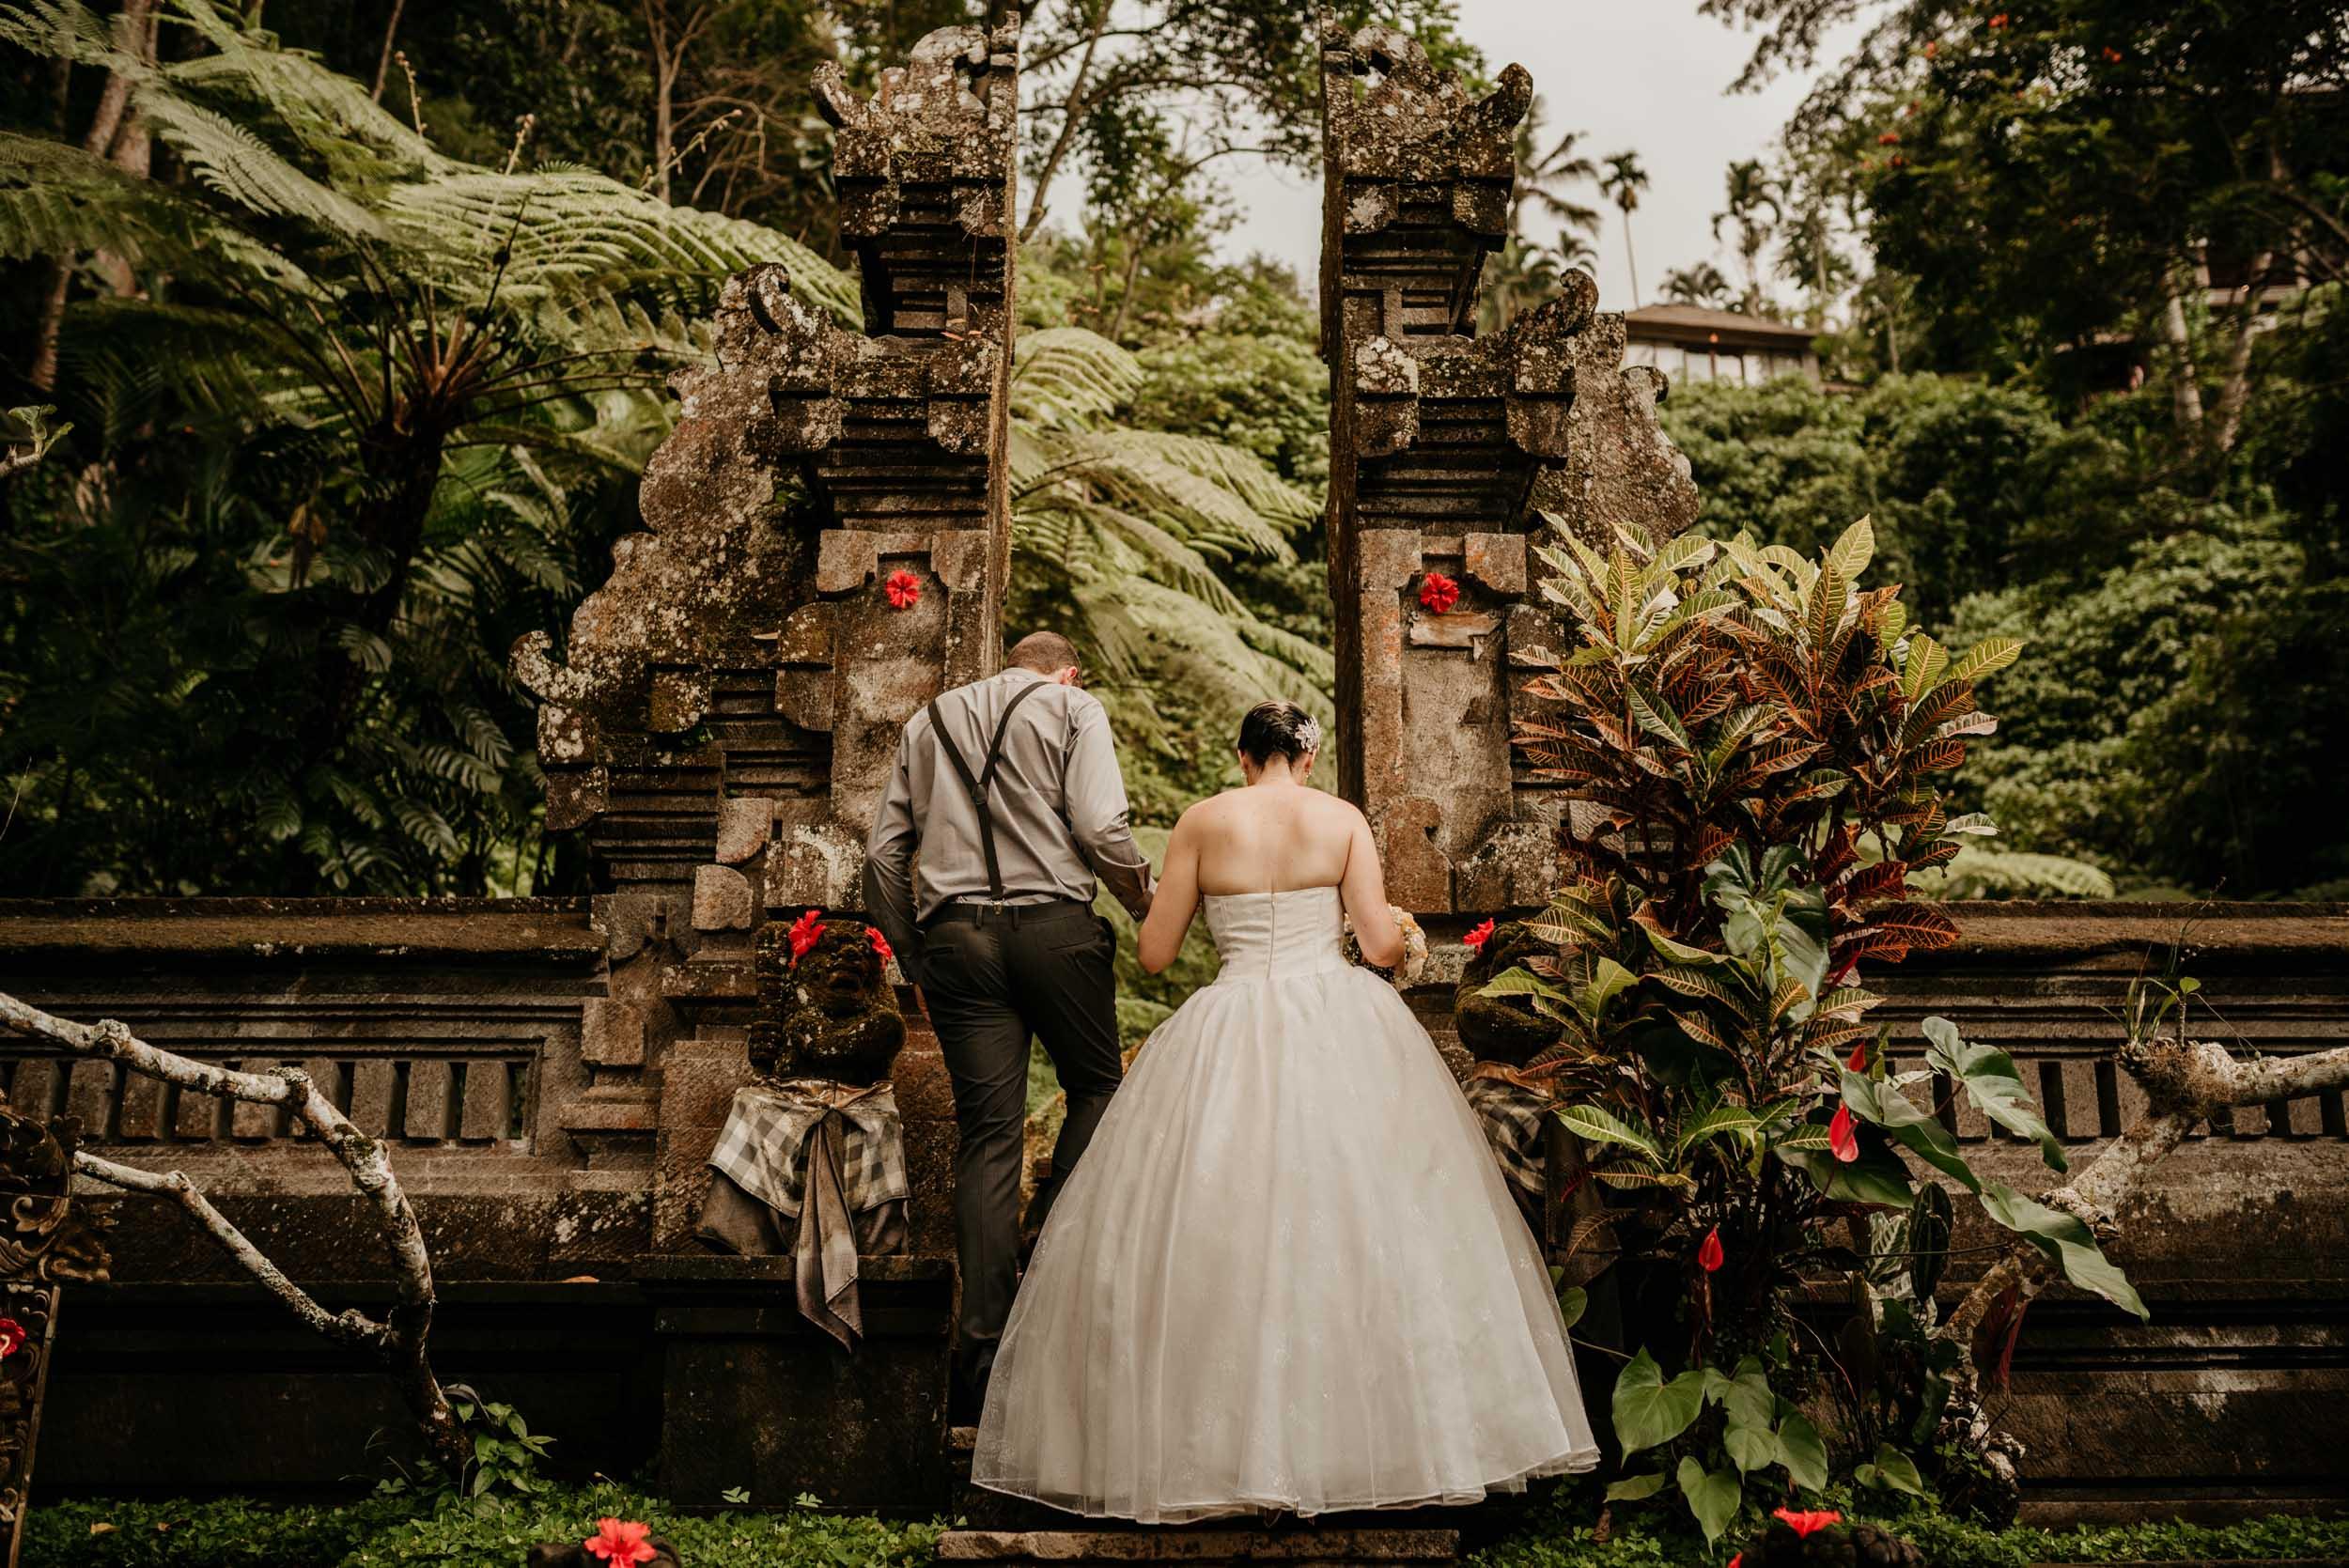 The Raw Photographer - Cairns Wedding Photographer - Bali Ubud Destination Photography - Travel - Australia - Asia Wed Photo Portrait-1.jpg